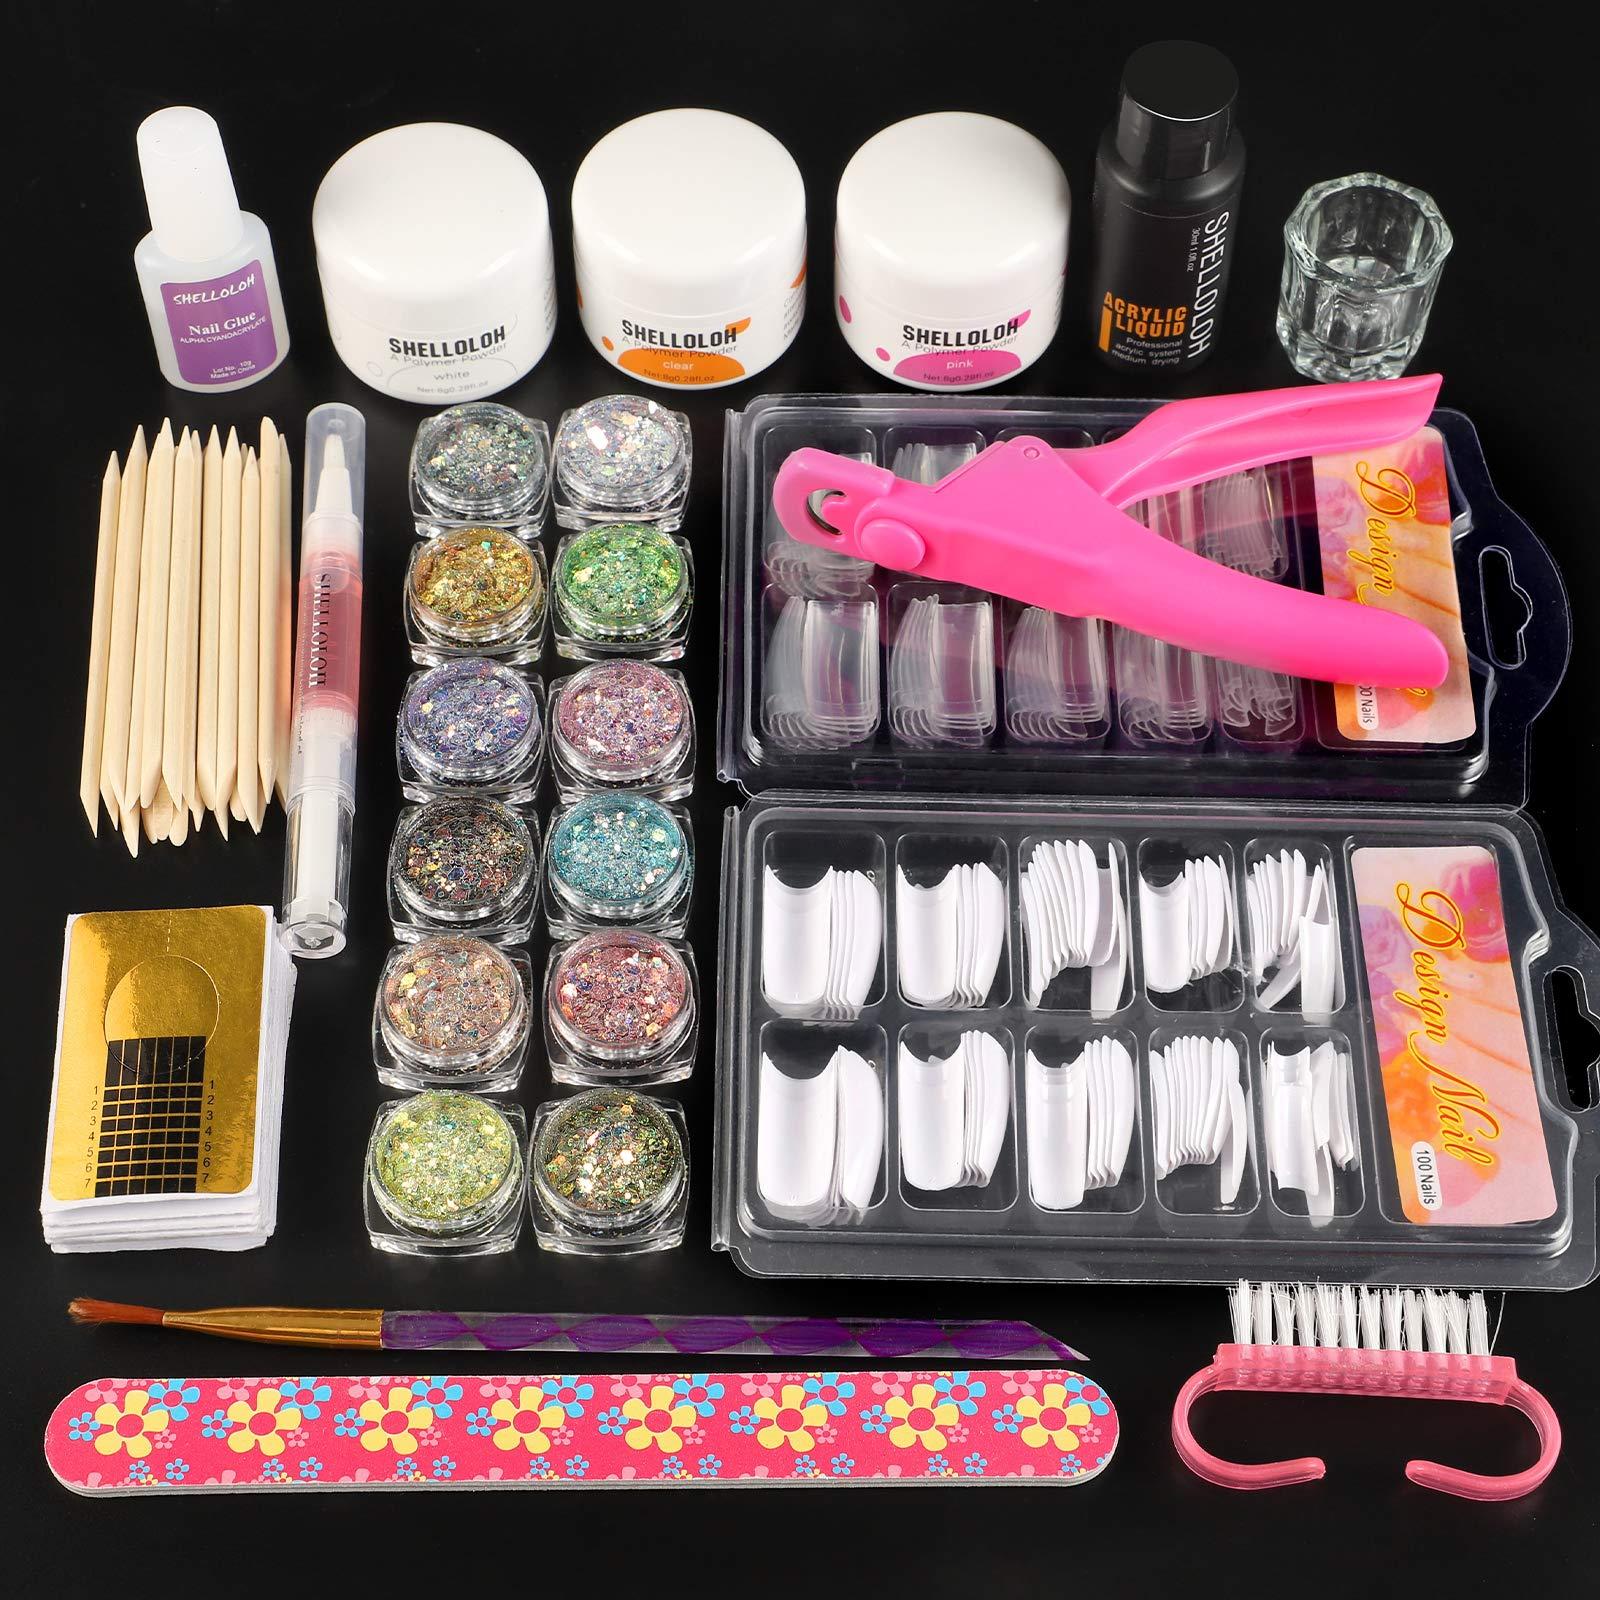 Acrylic Nail Kit-3 Pcs Acrylic Powder with Acrylic Liquid Monomer Glitter Gel